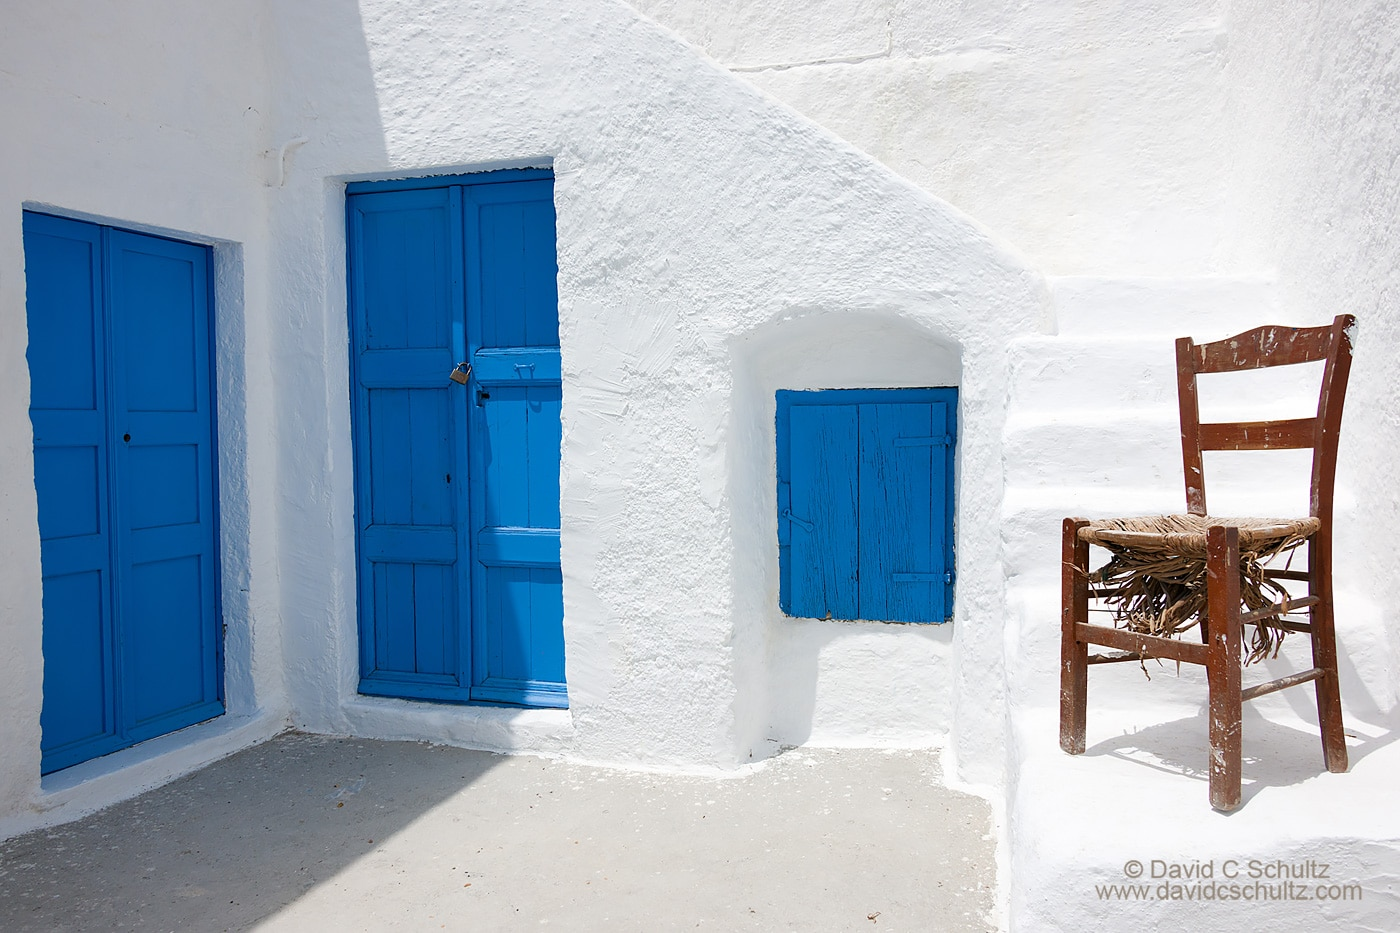 Oia, Santorini, Greece - Image #202-85